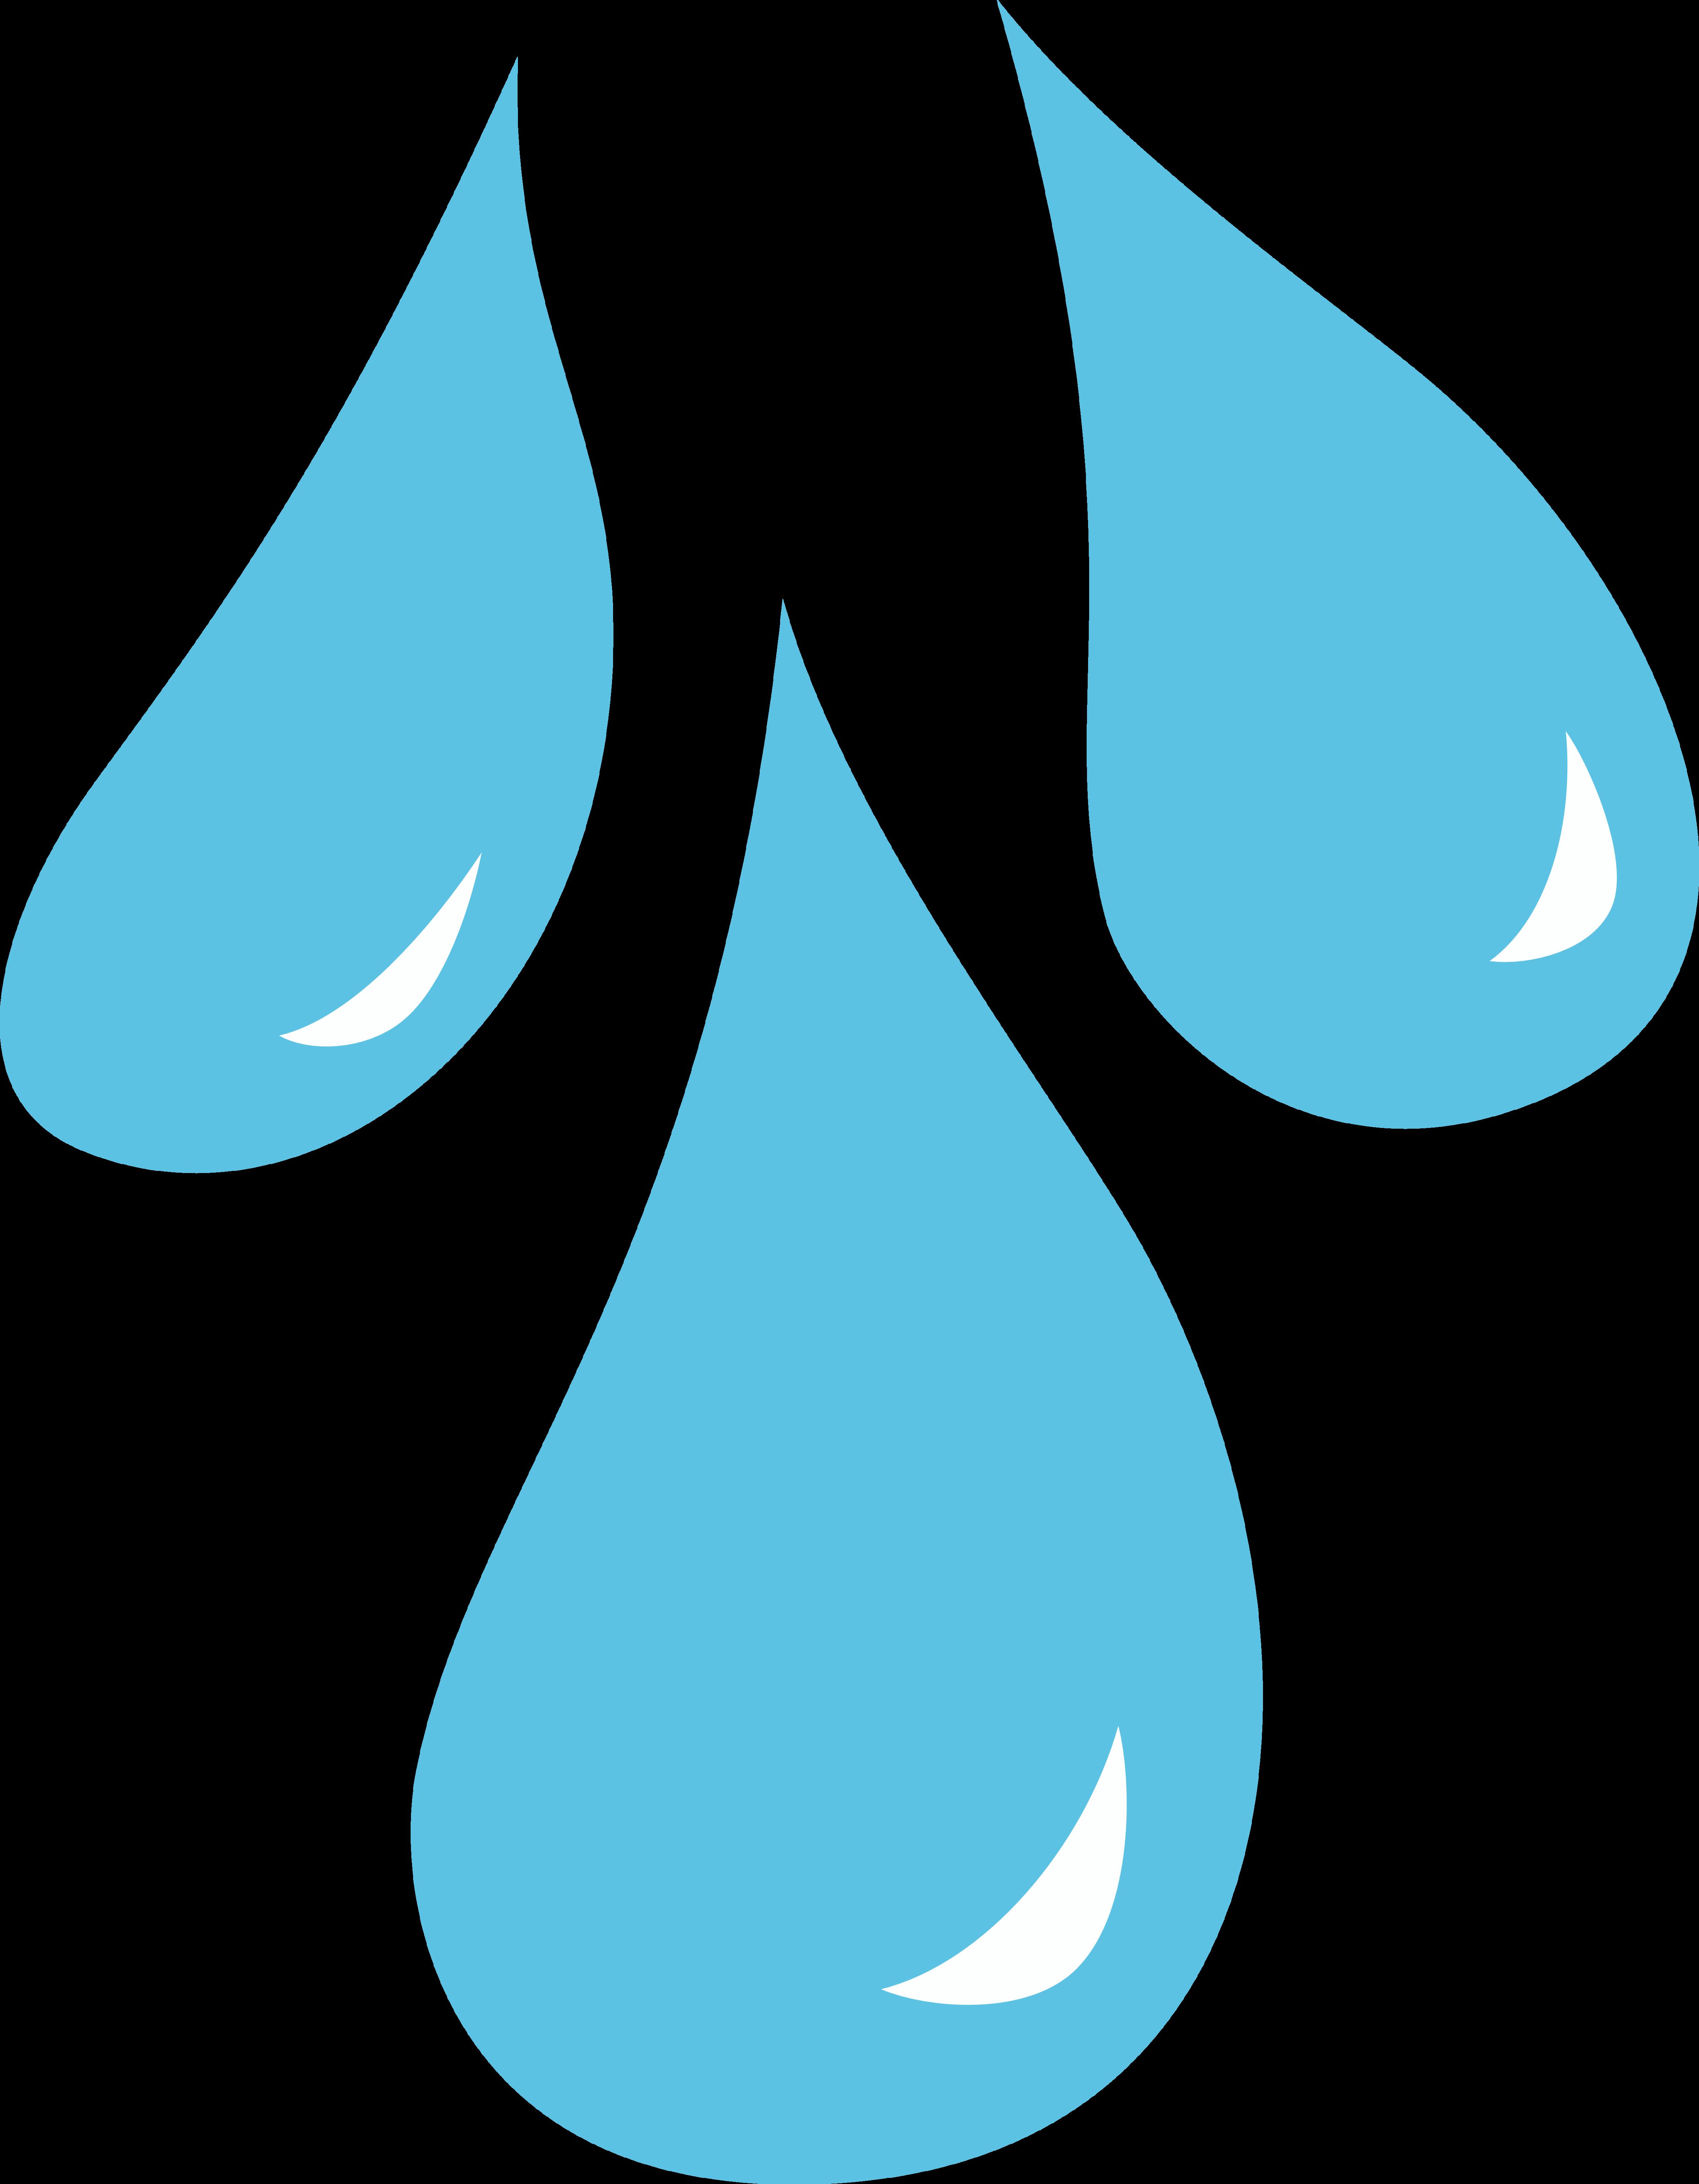 raindrop splash clipart 20 free Cliparts | Download images ...